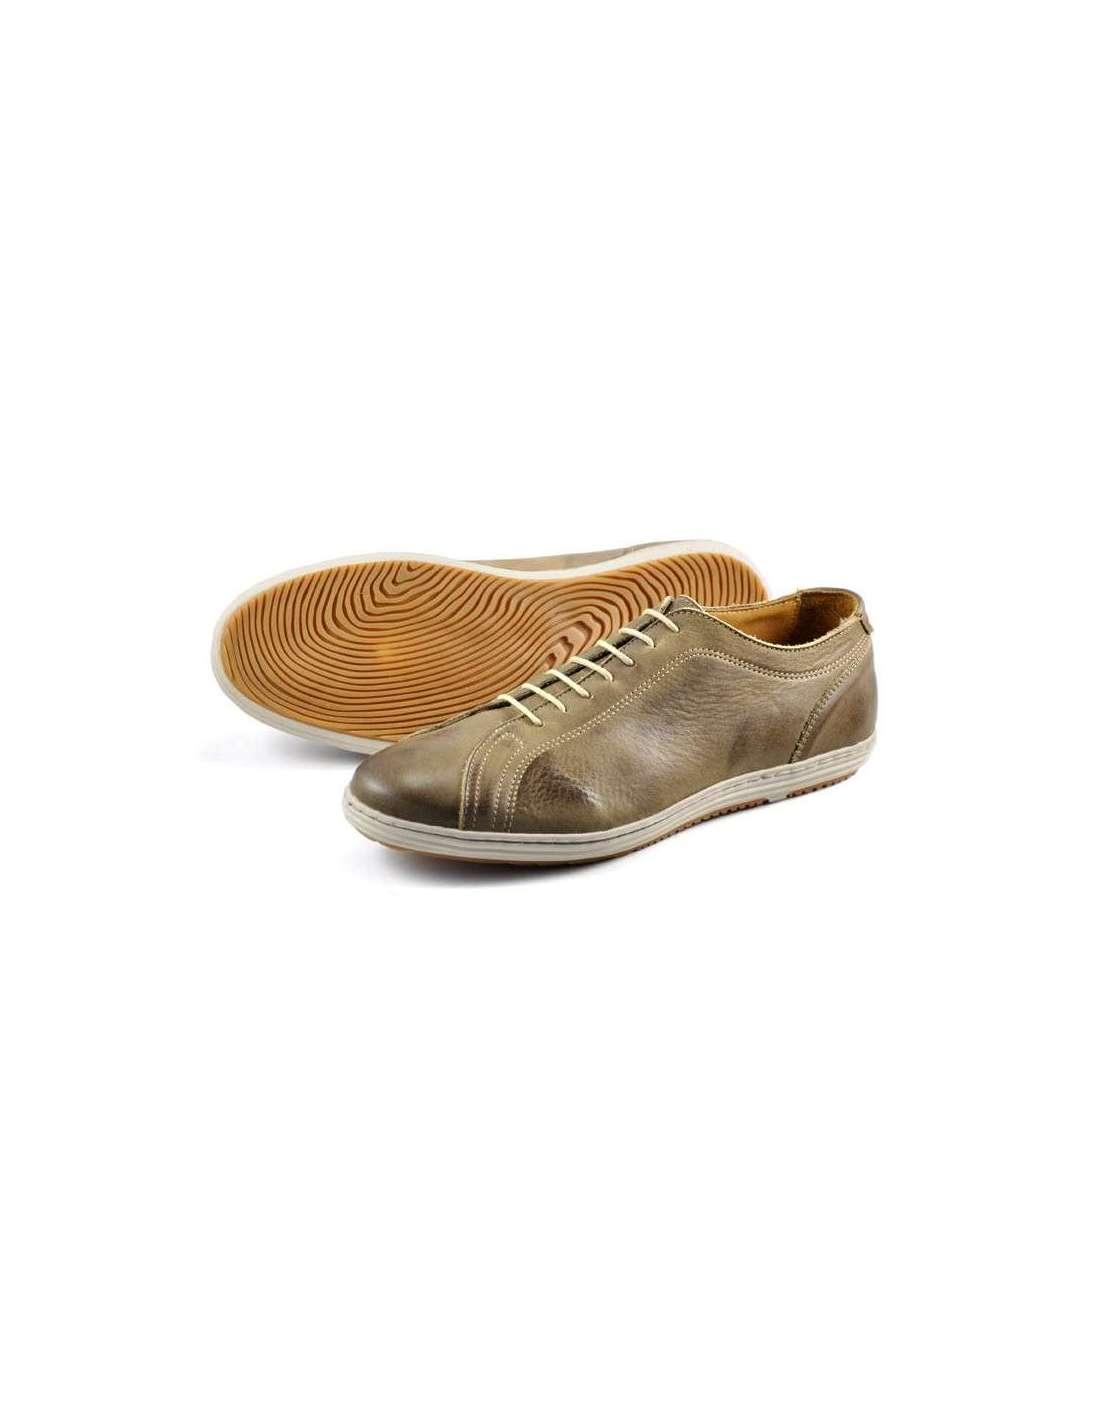 Caja de limpieza para zapatos - Limpiar madera barnizada ...